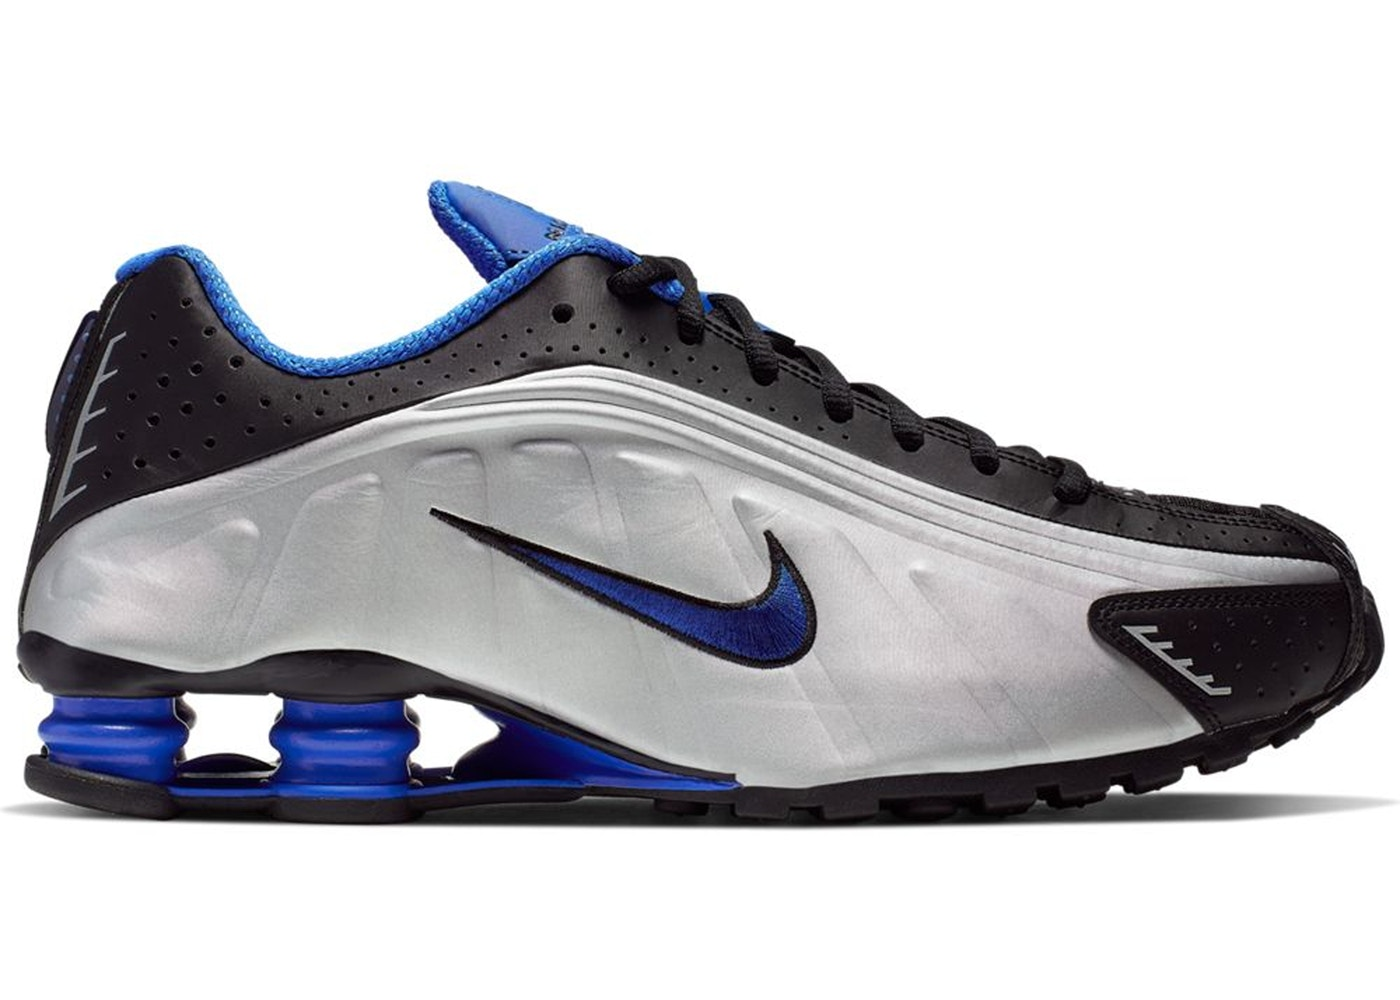 wholesale dealer 11456 801e9 Nike Shox R4 Racer Blue